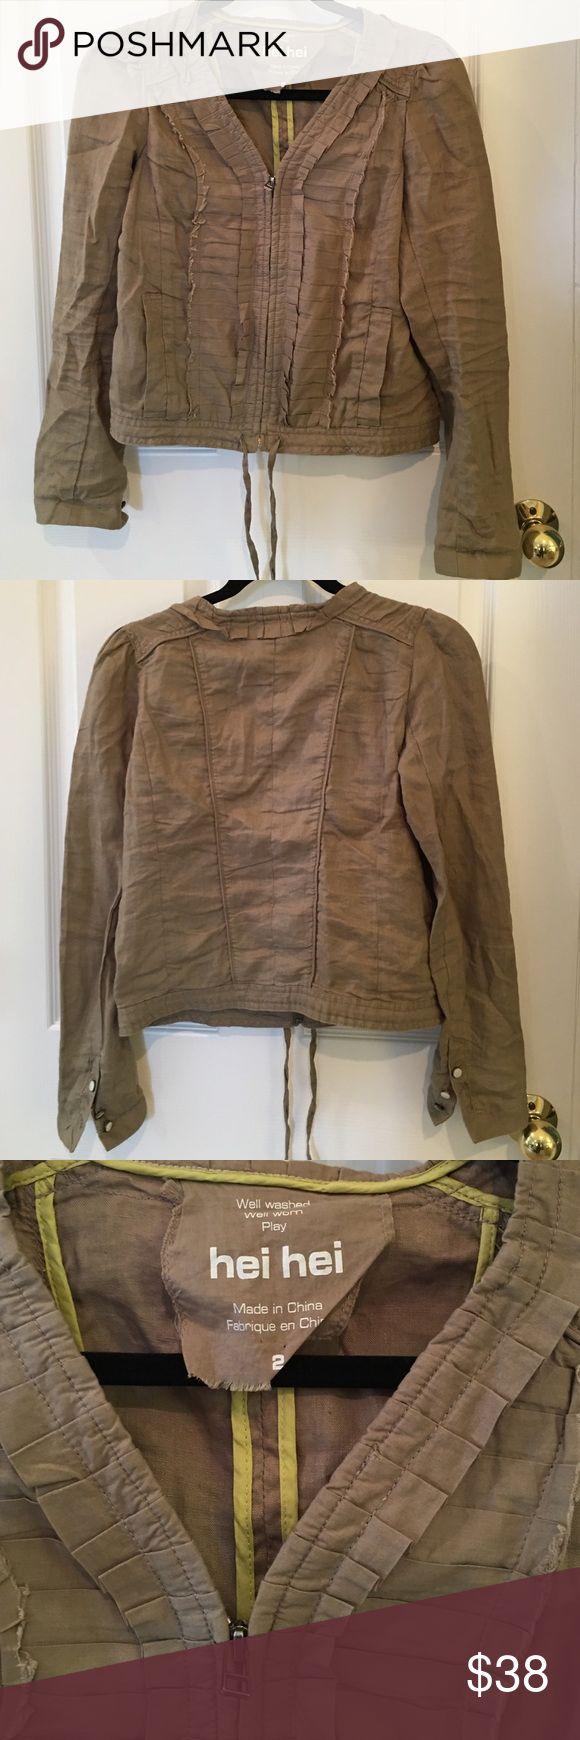 Anthropologie Hei Hei linen jacket Super cute linen jacket by hei hei from Anthropologie. Hei hei Jackets & Coats Utility Jackets